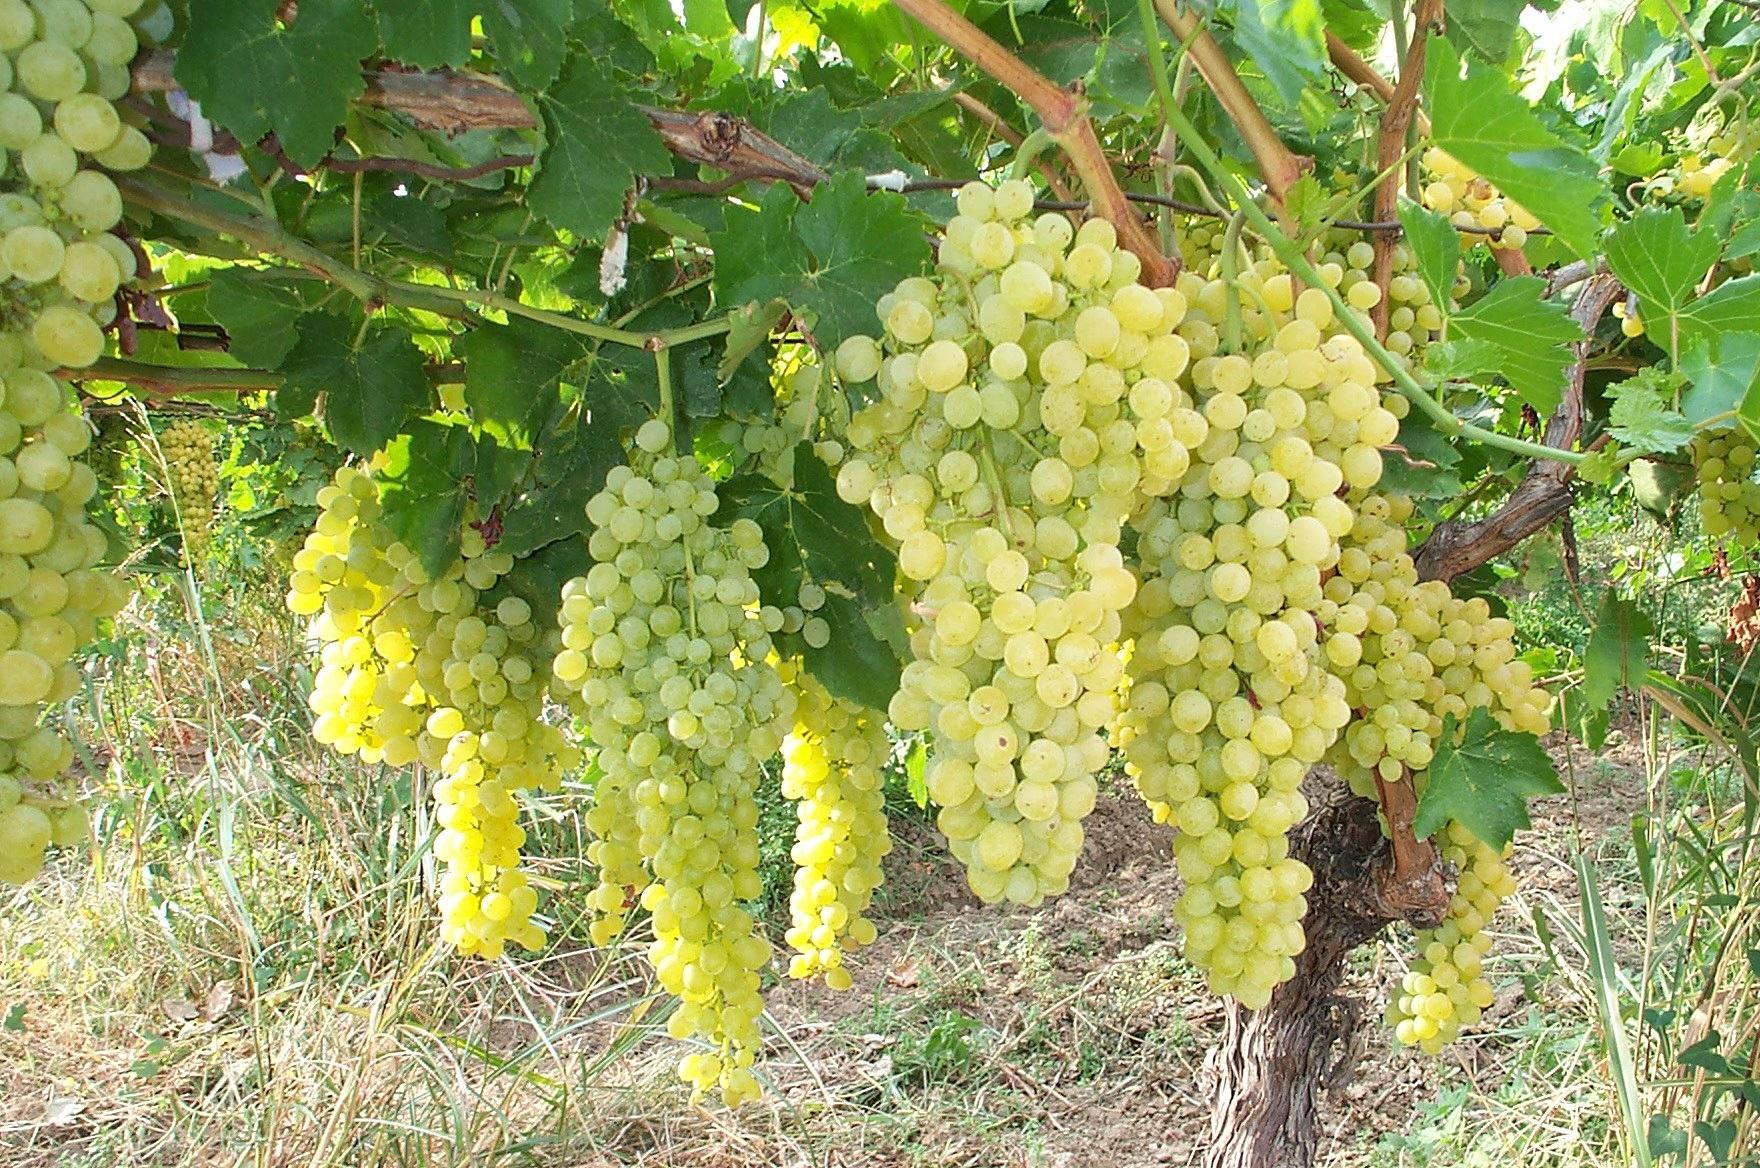 виноград обрезка весной схема